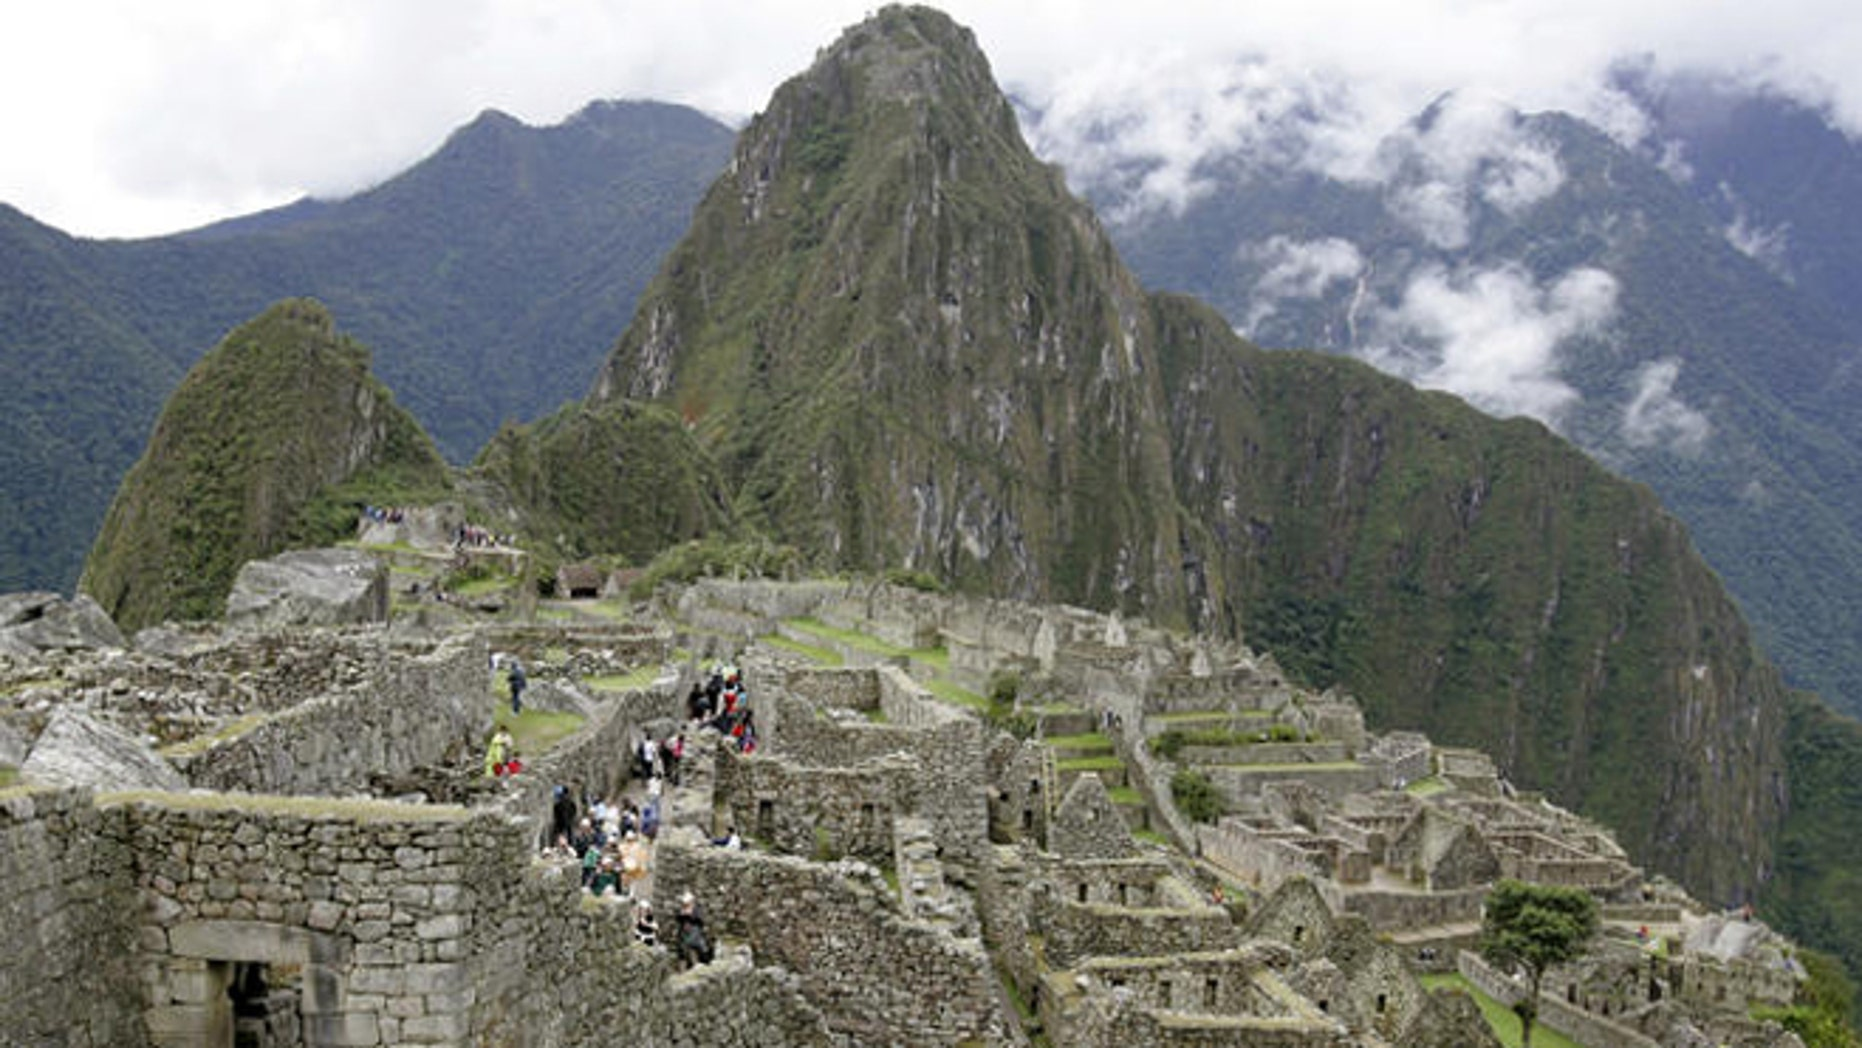 View of  Peru's famed Machu Picchu ruins in this July, 2006, file photo. (AP Photo/Martin Mejia)